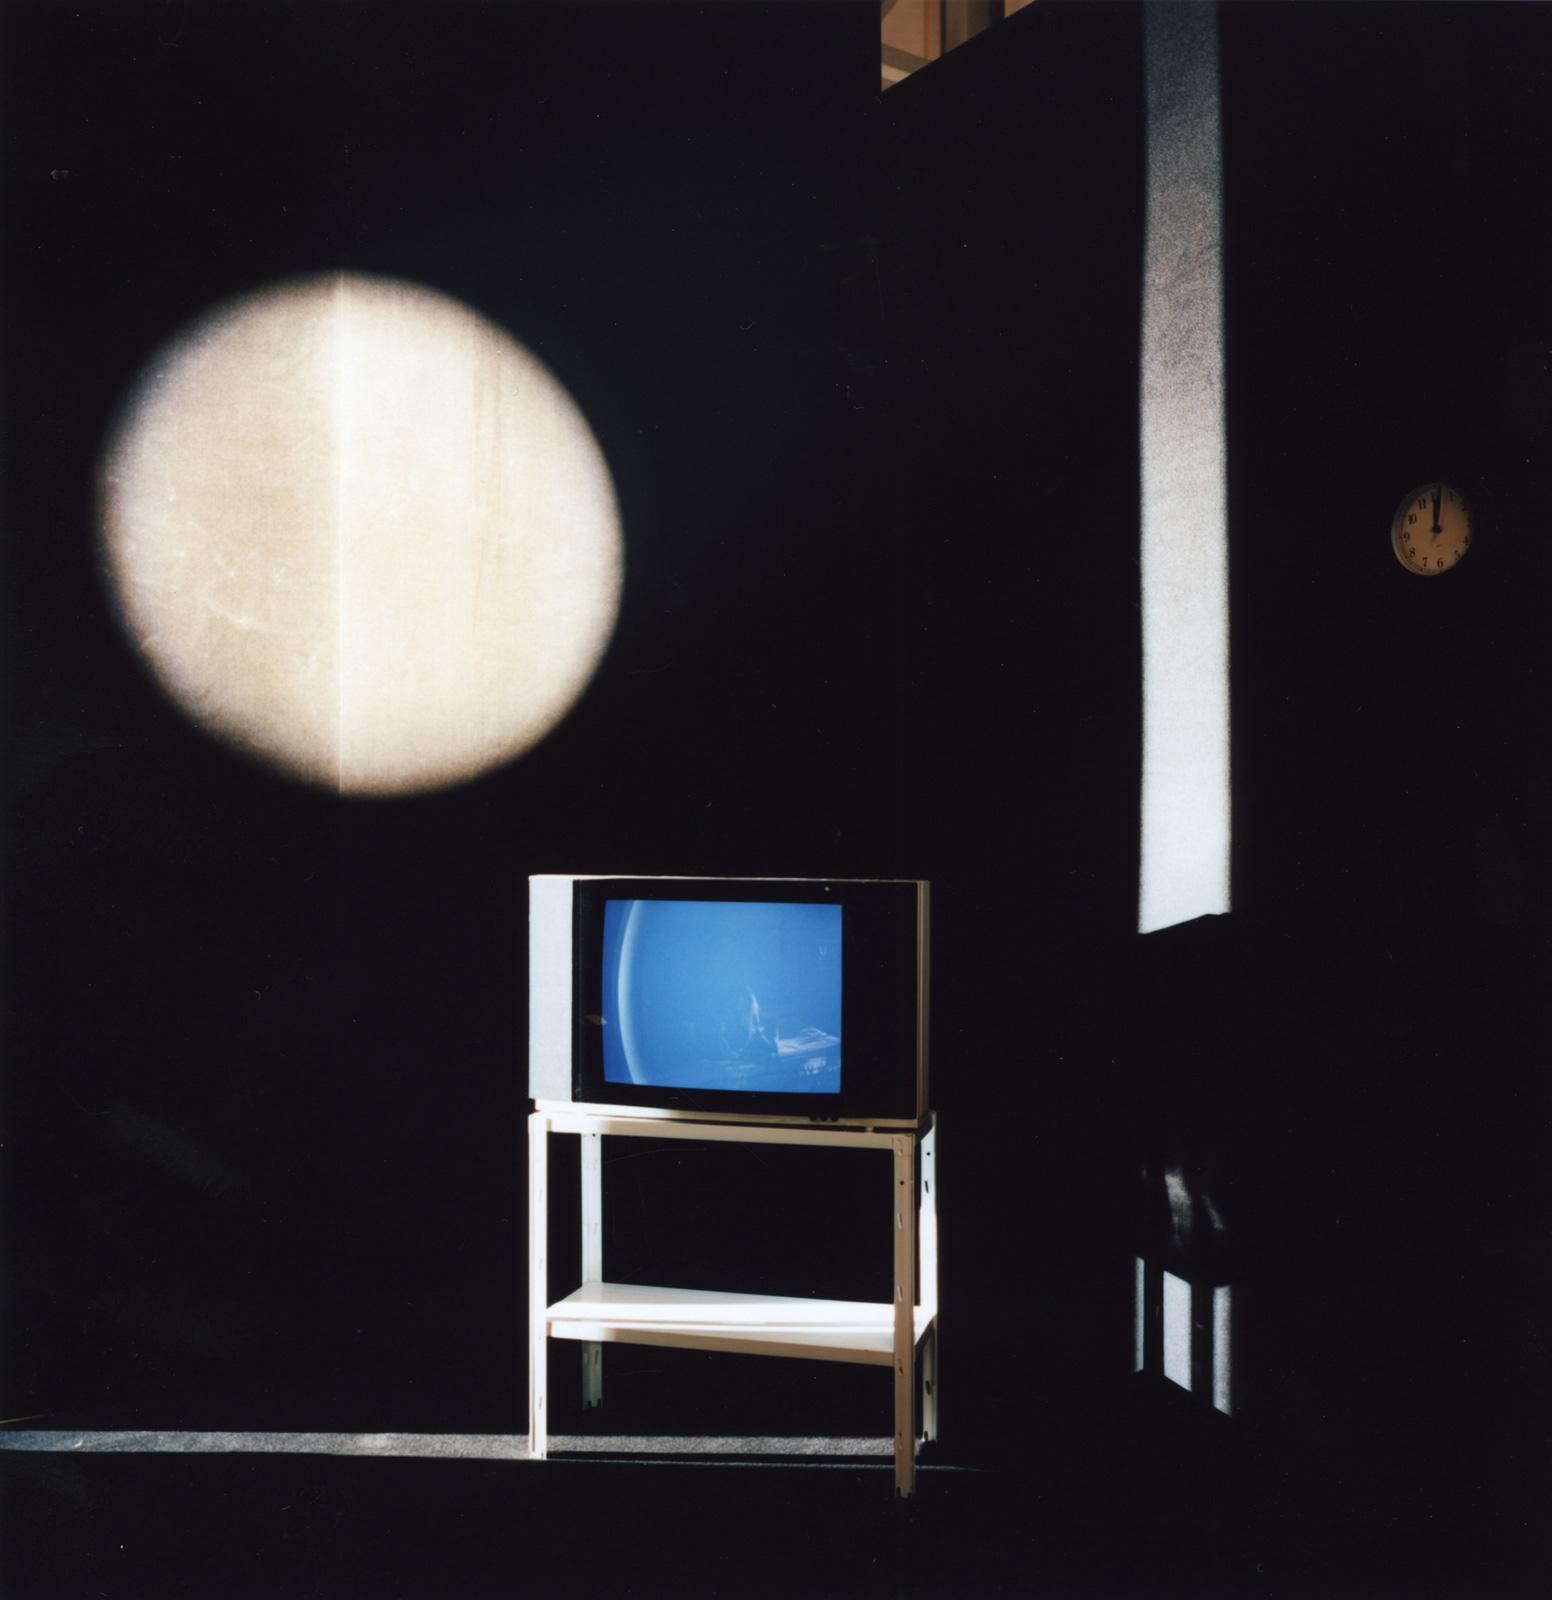 Room 2202, 2011. C-print, 80 x 80 cm